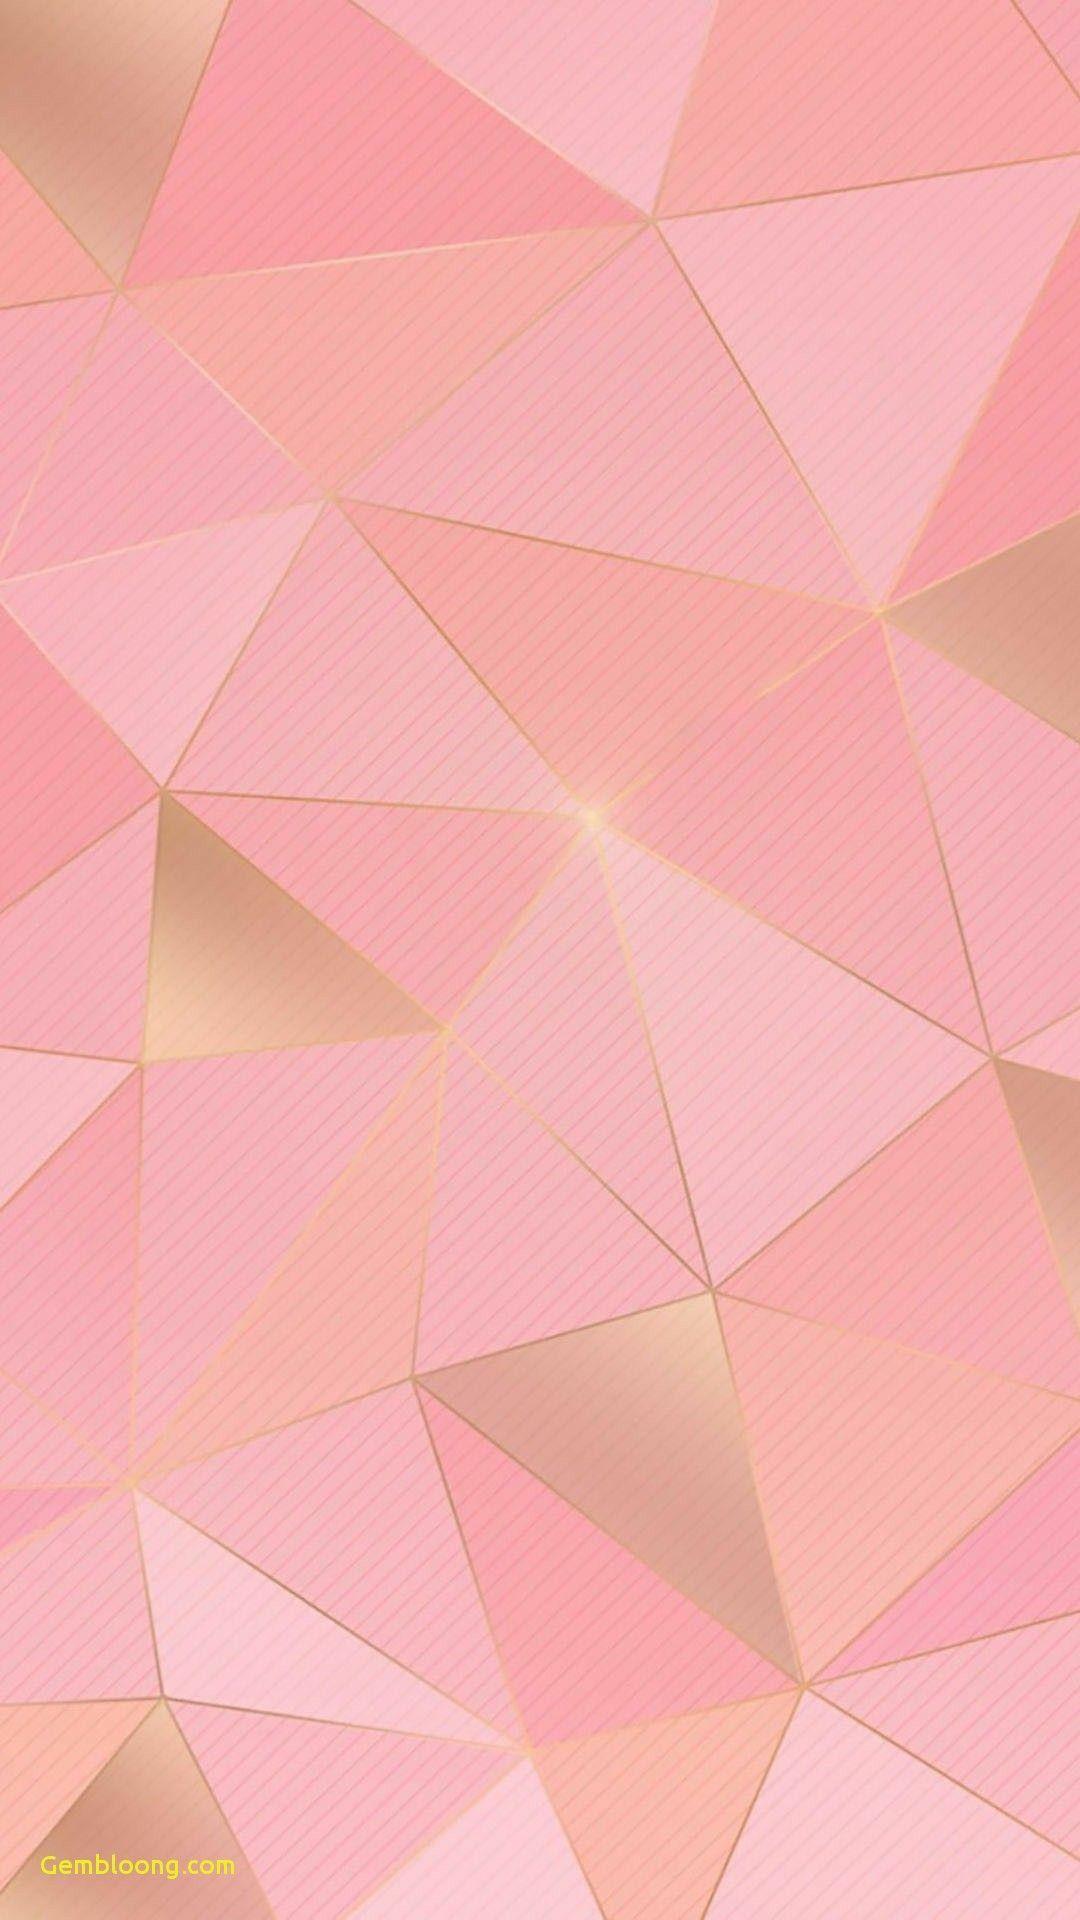 Rose Gold iPhone wallpaper